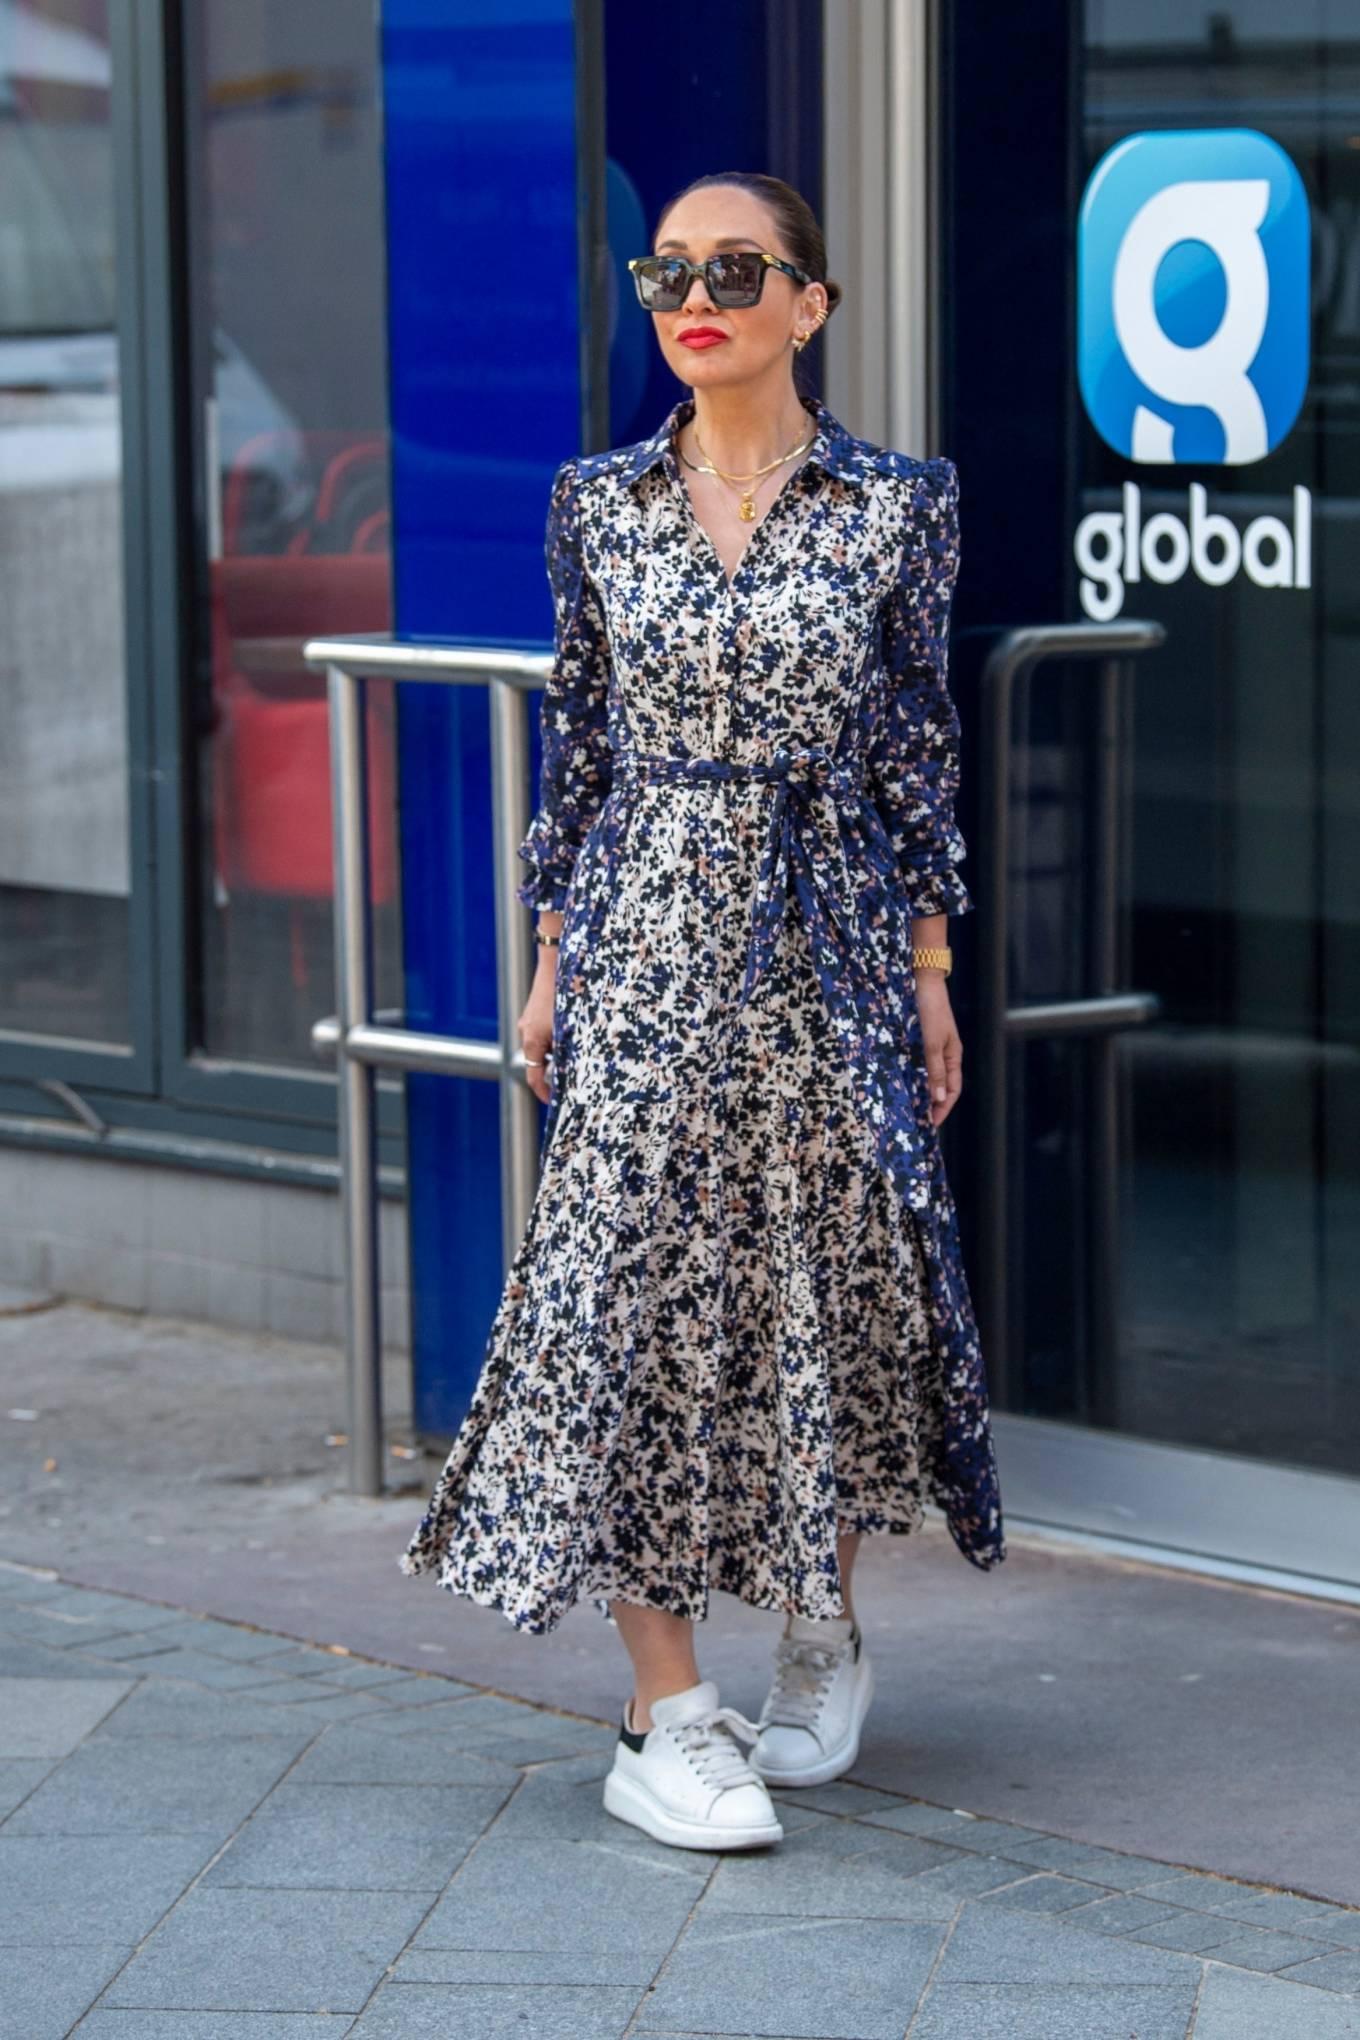 Myleene Klass 2021 : Myleene Klass – In a long summer dress arriving at the Global studios -20